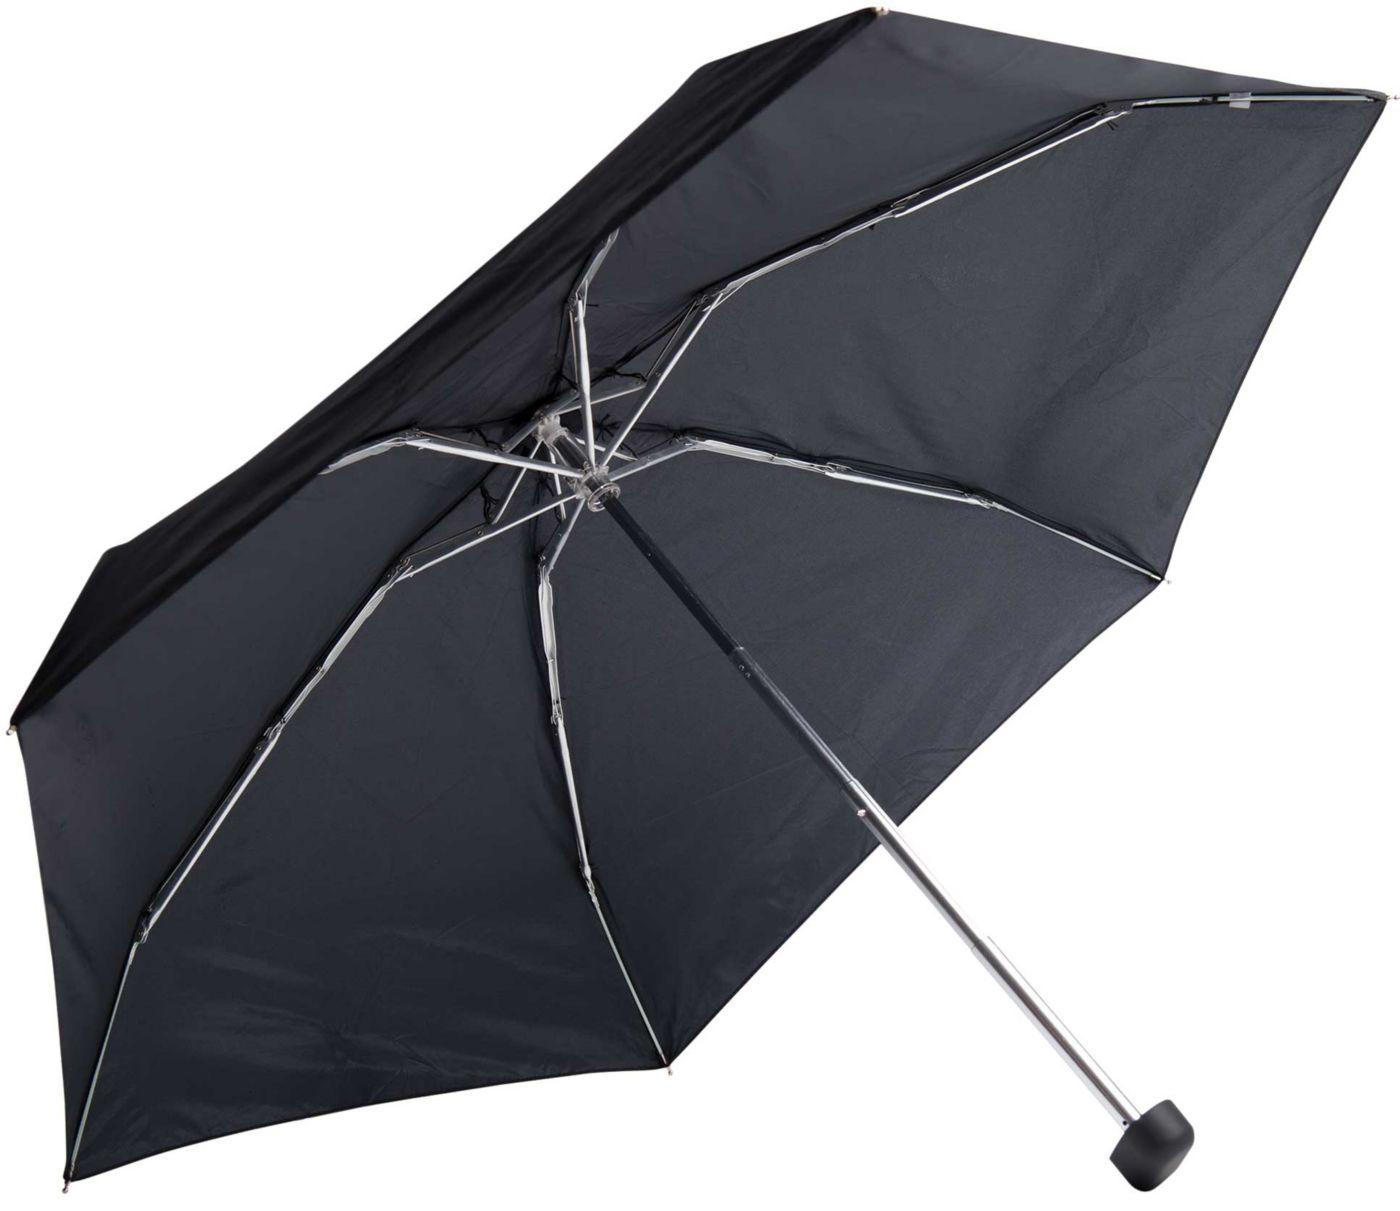 Sea to Summit Travelling Light Pocket Umbrella